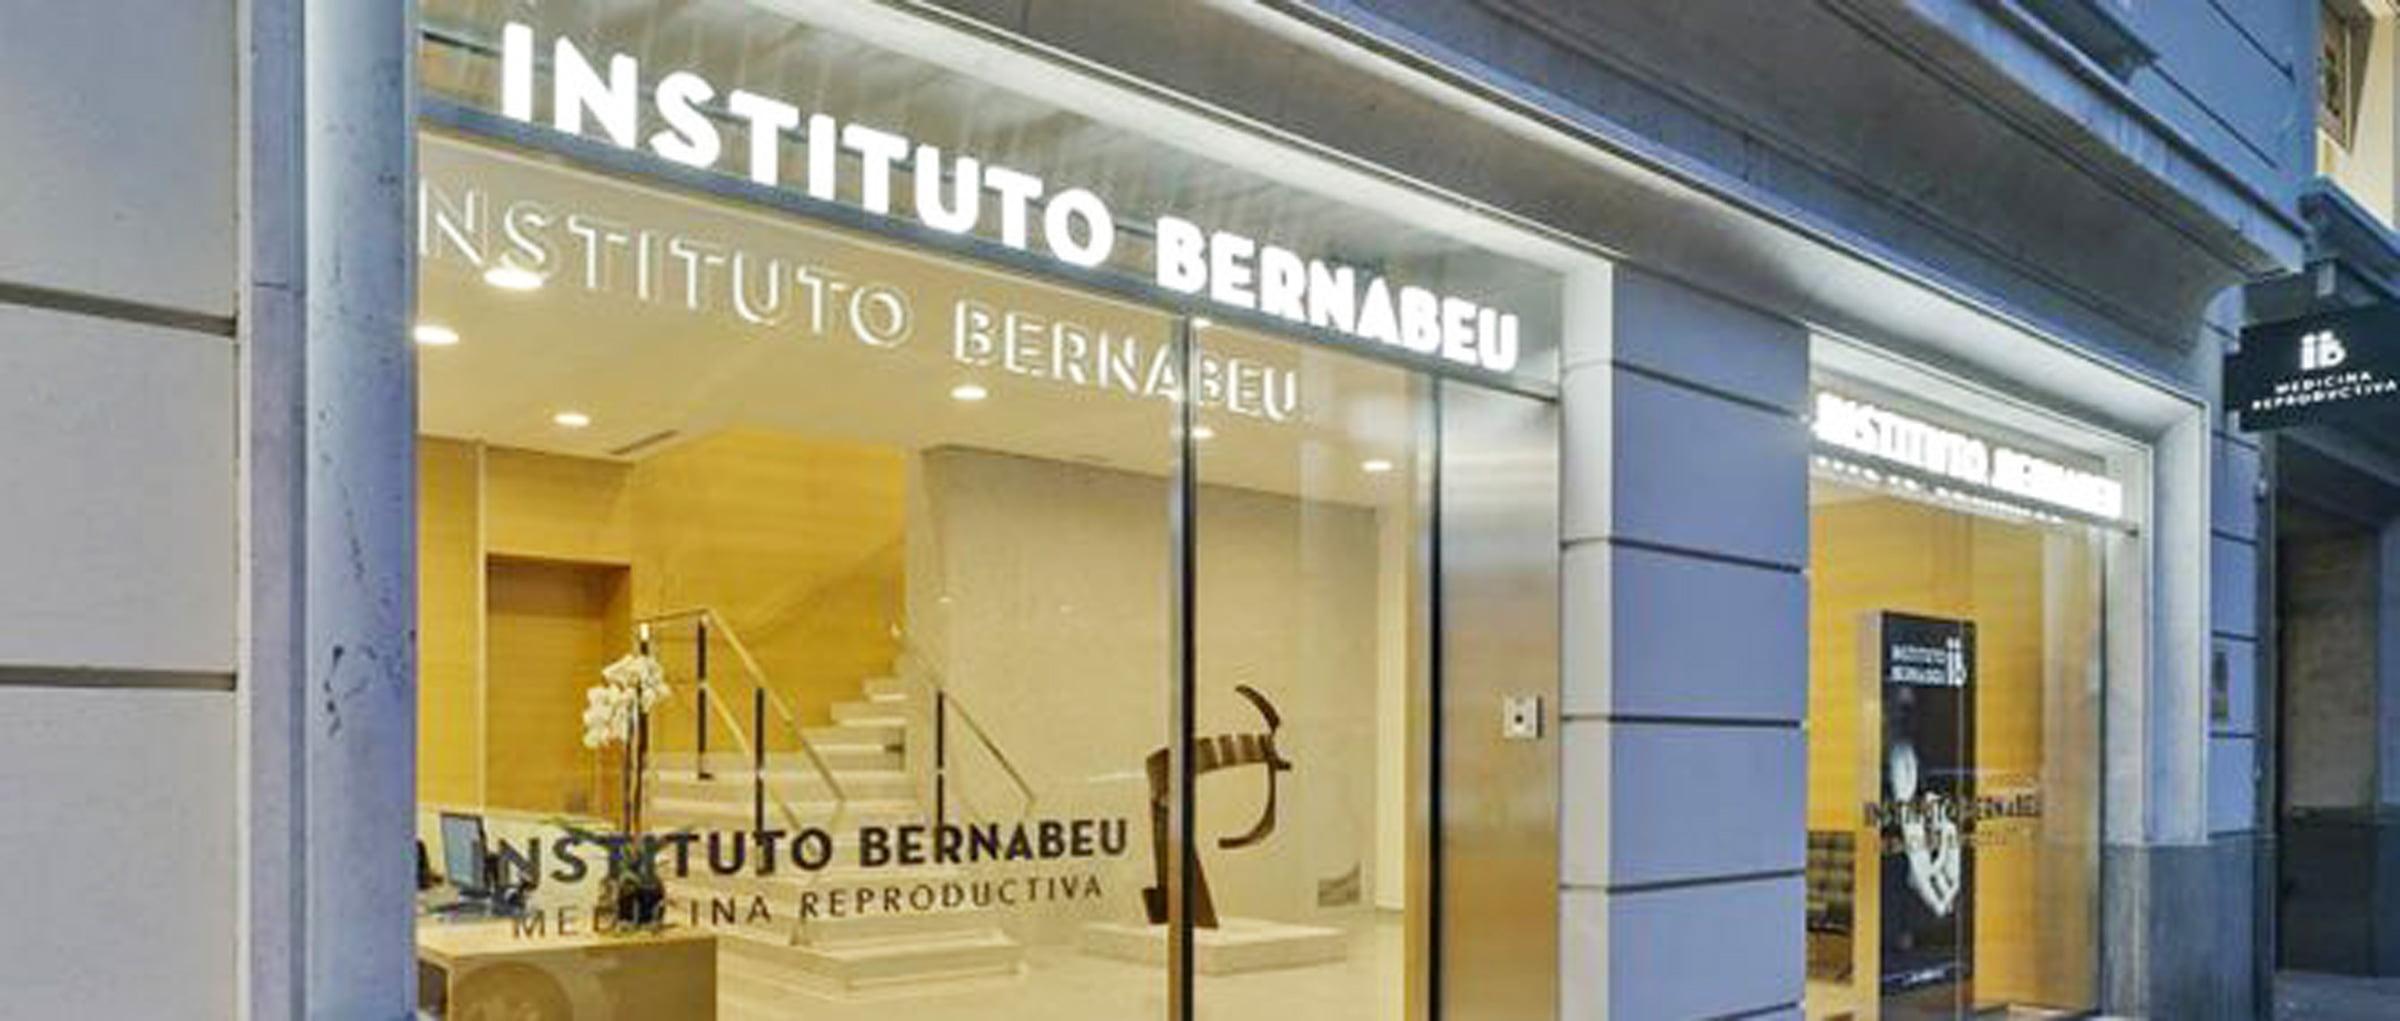 Instituto Bernabeu Madrid